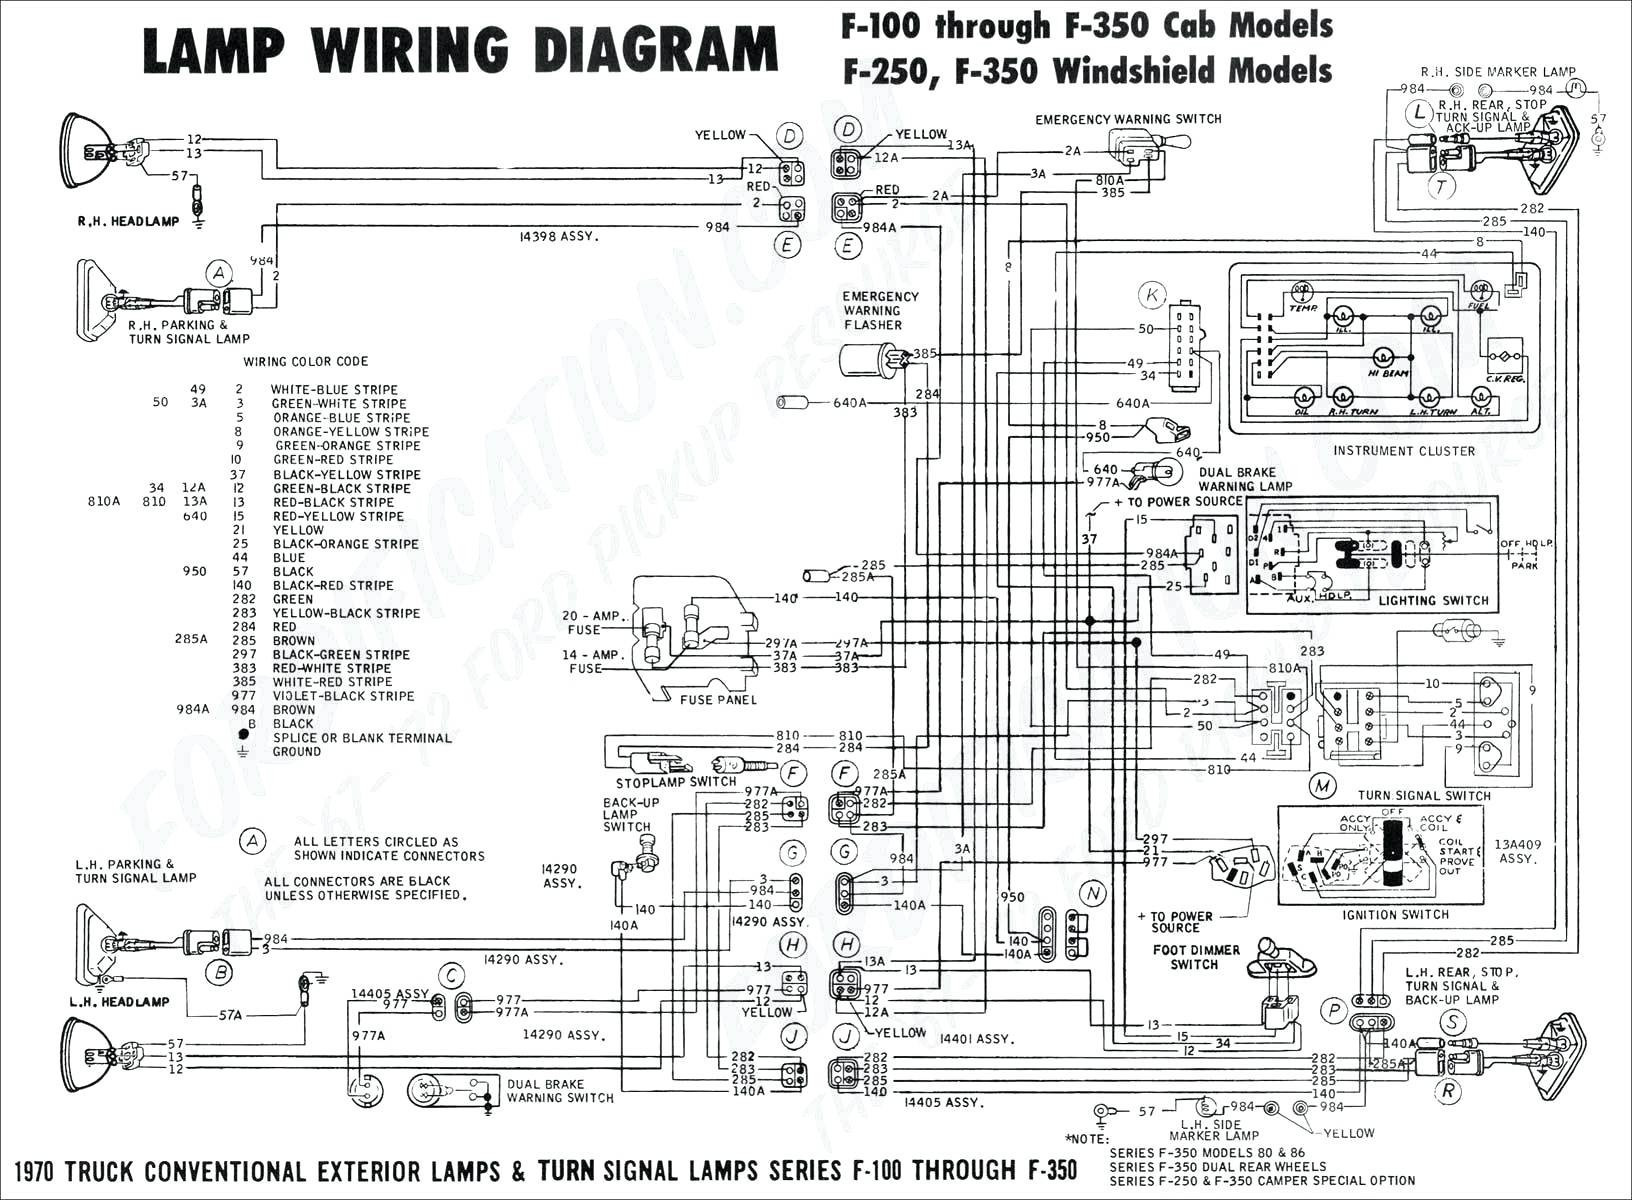 Bw 3961  Diagram Of Engine 4 5 Liter Cadillac Schematic